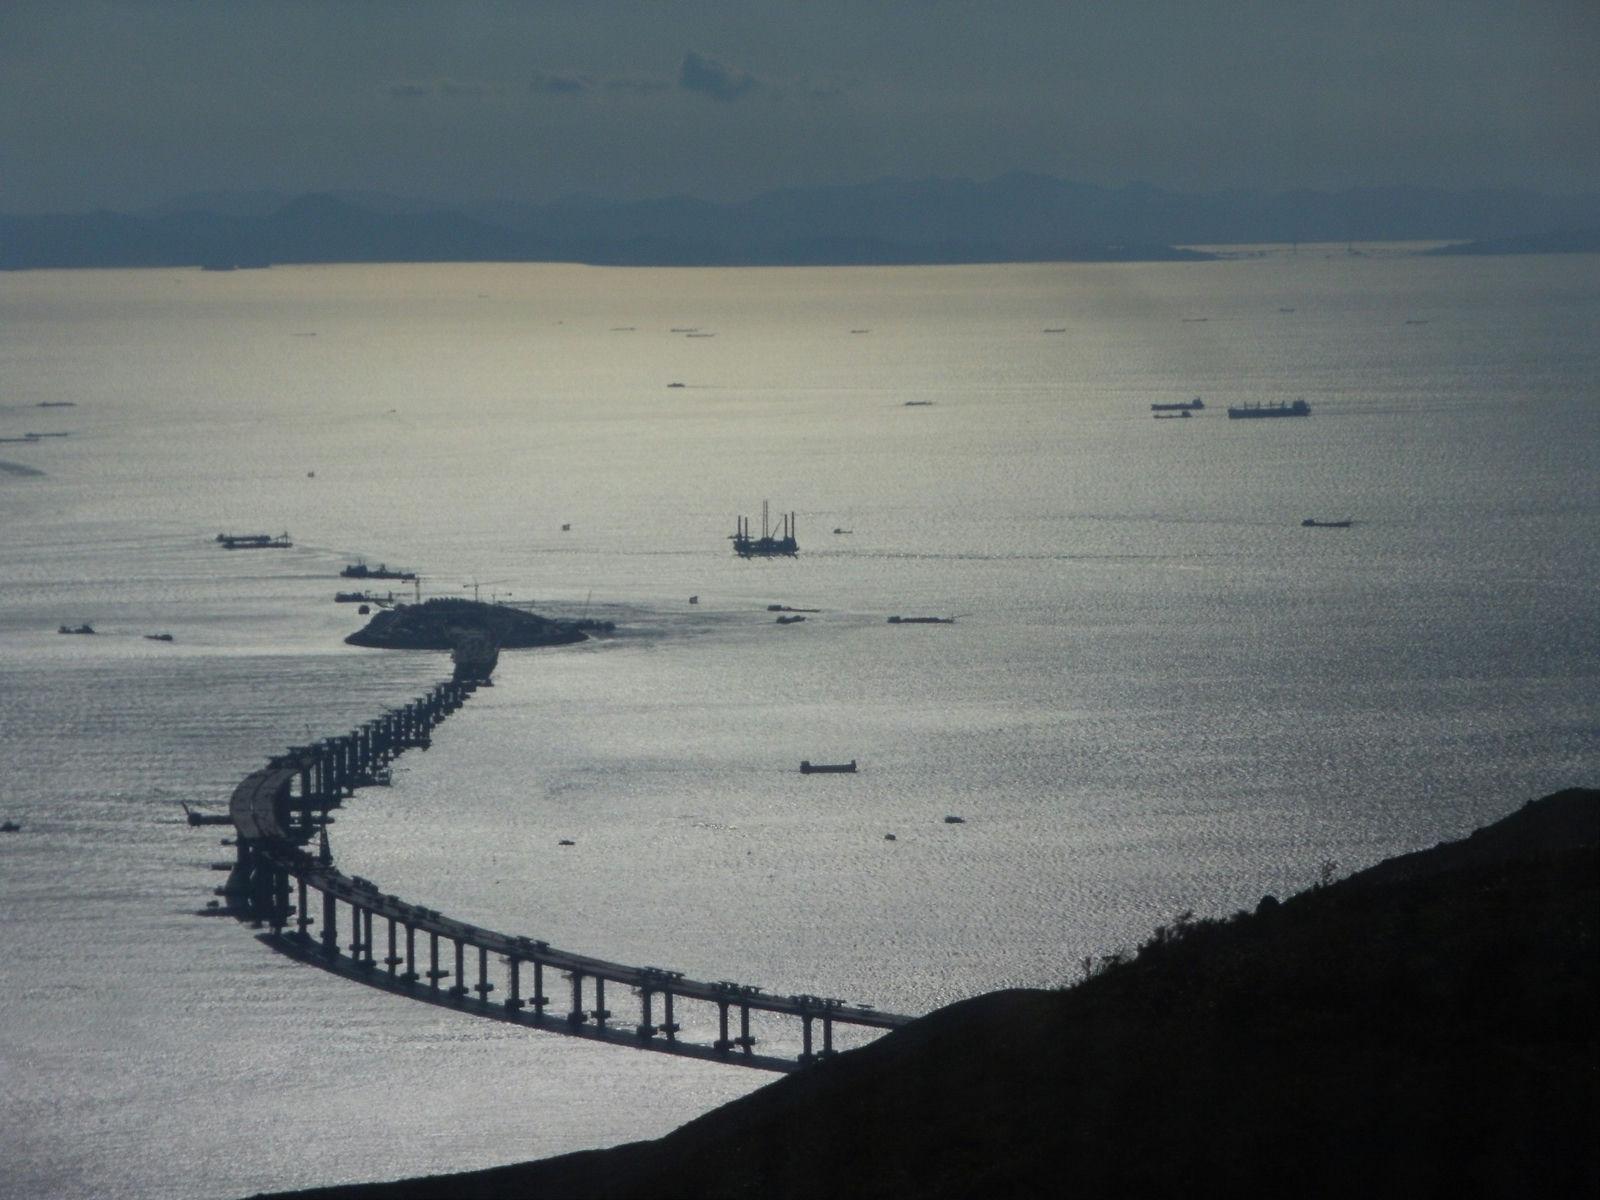 Hong Kong Macau Zhuhai Bridge from Ngong Ping 360 Cable Car